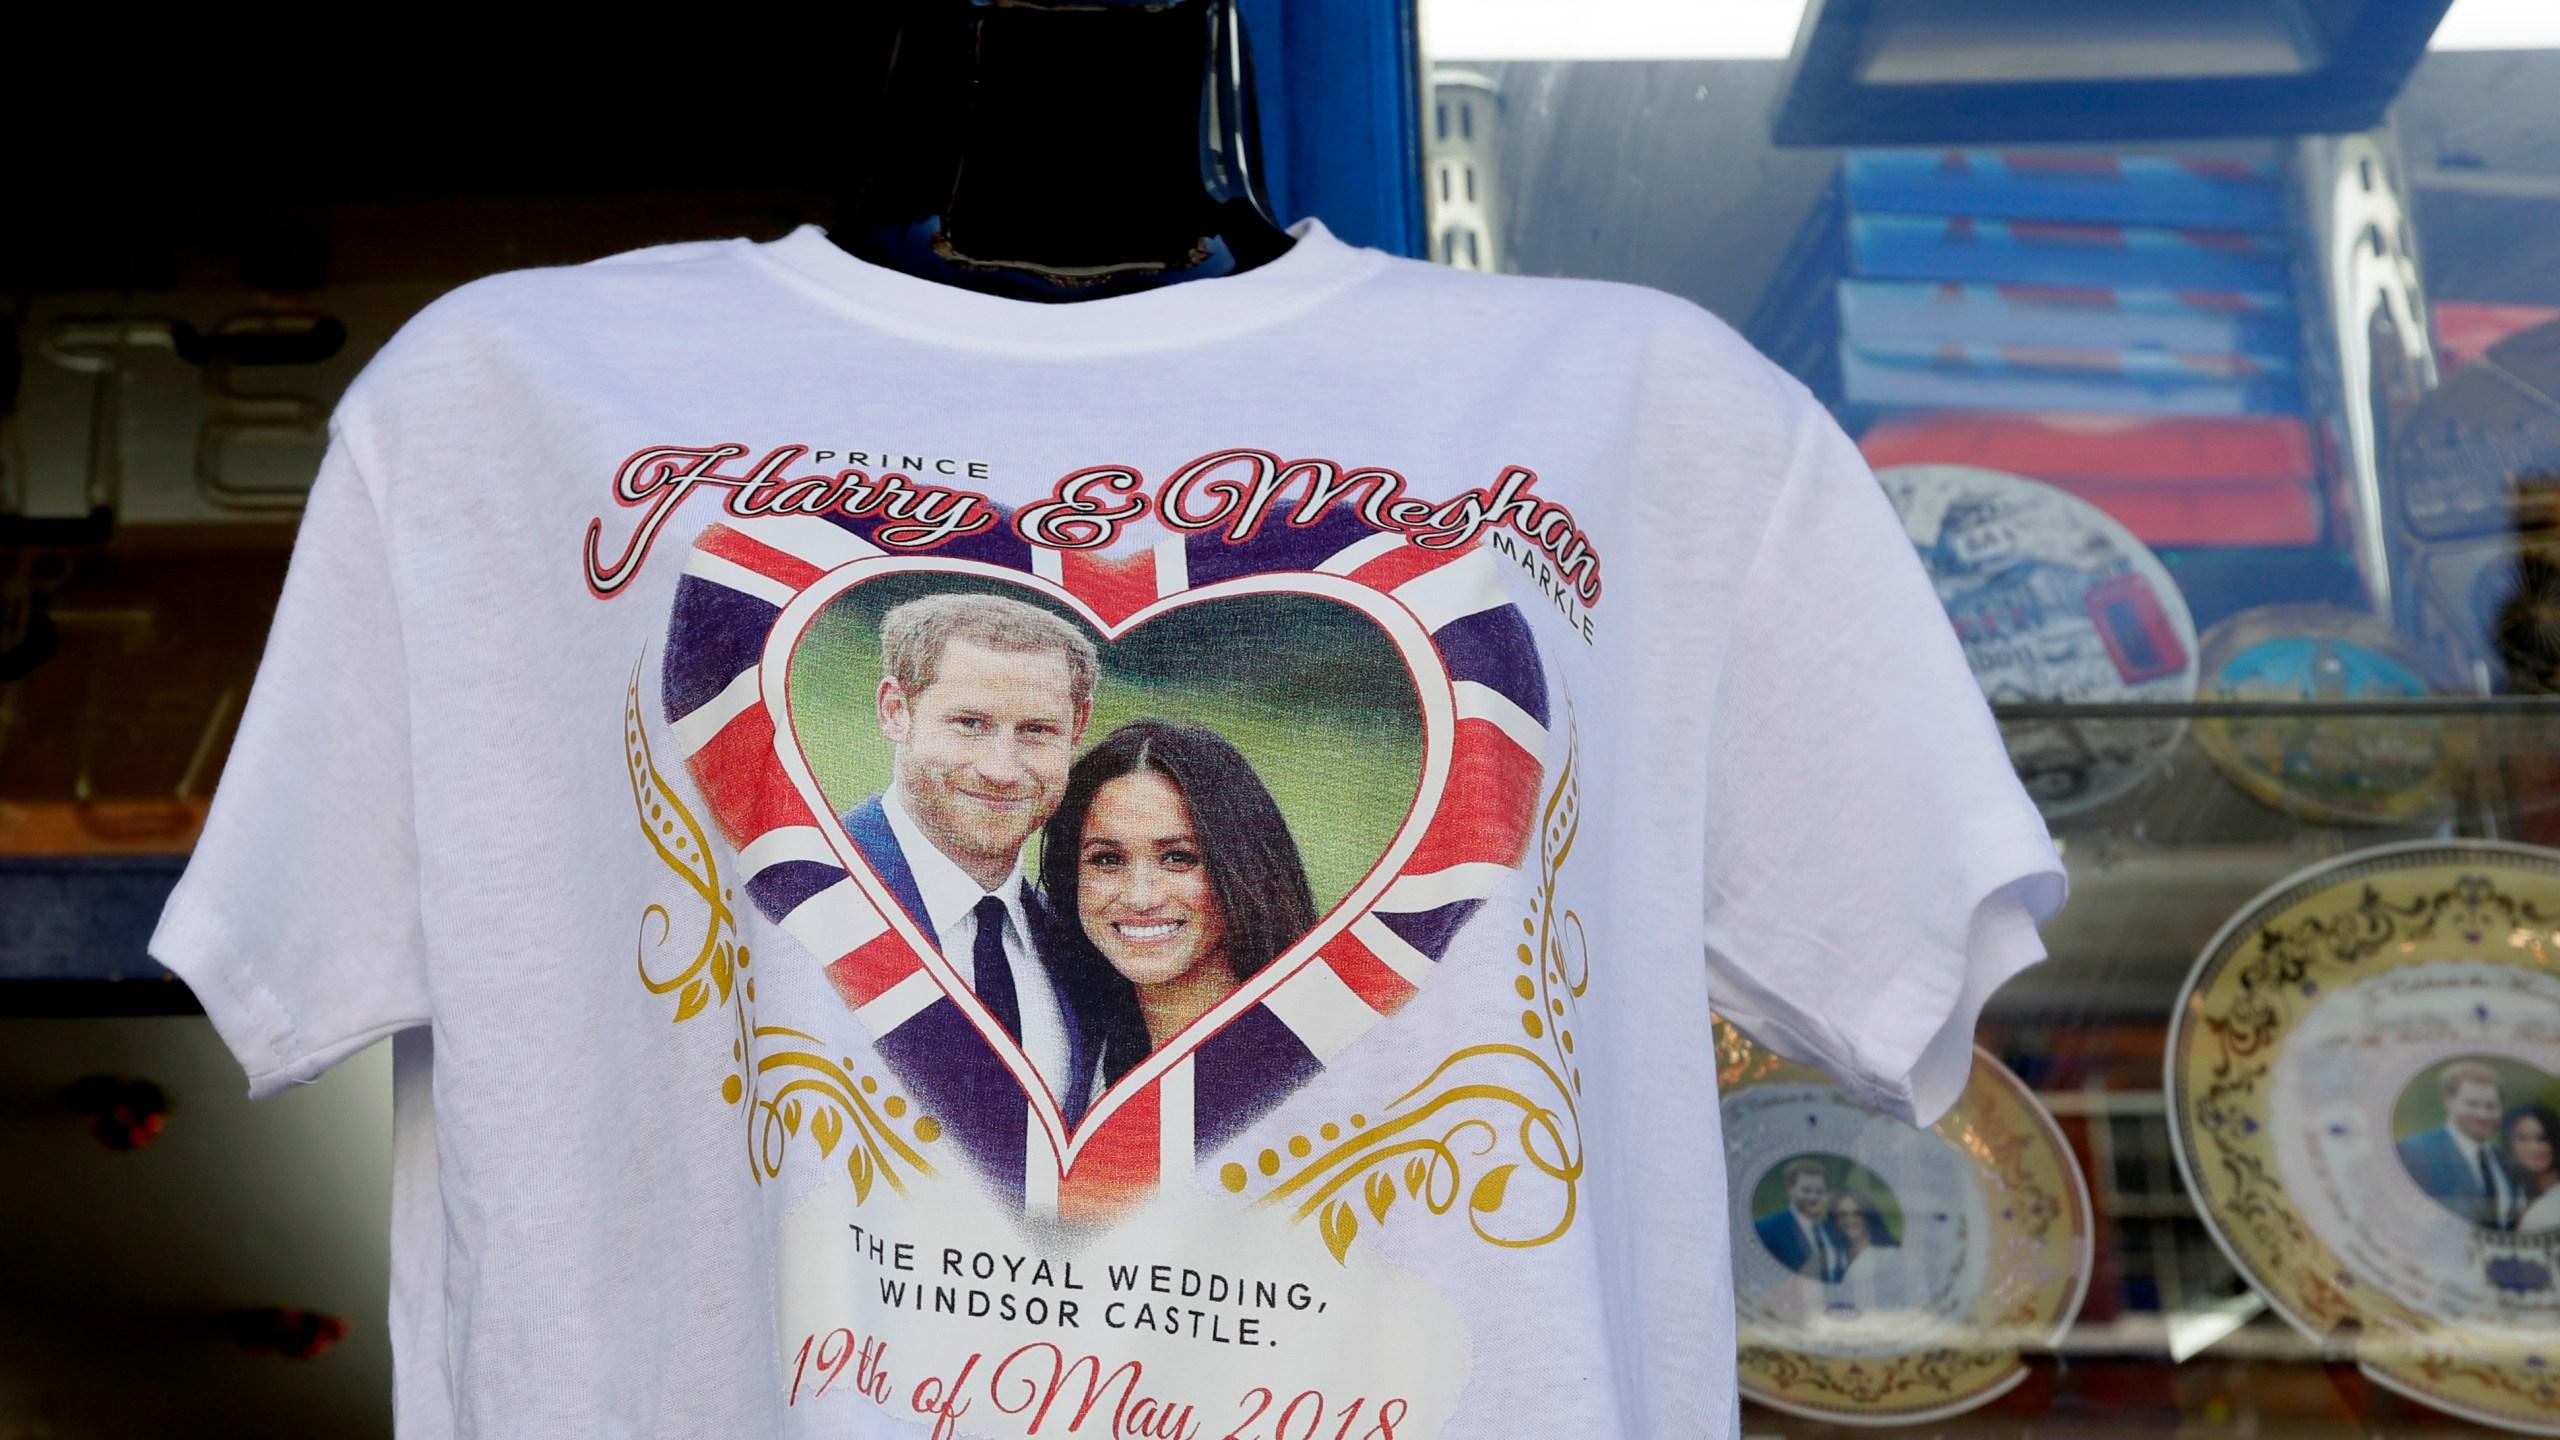 Britain_Royal_Wedding_20994-159532.jpg39099128